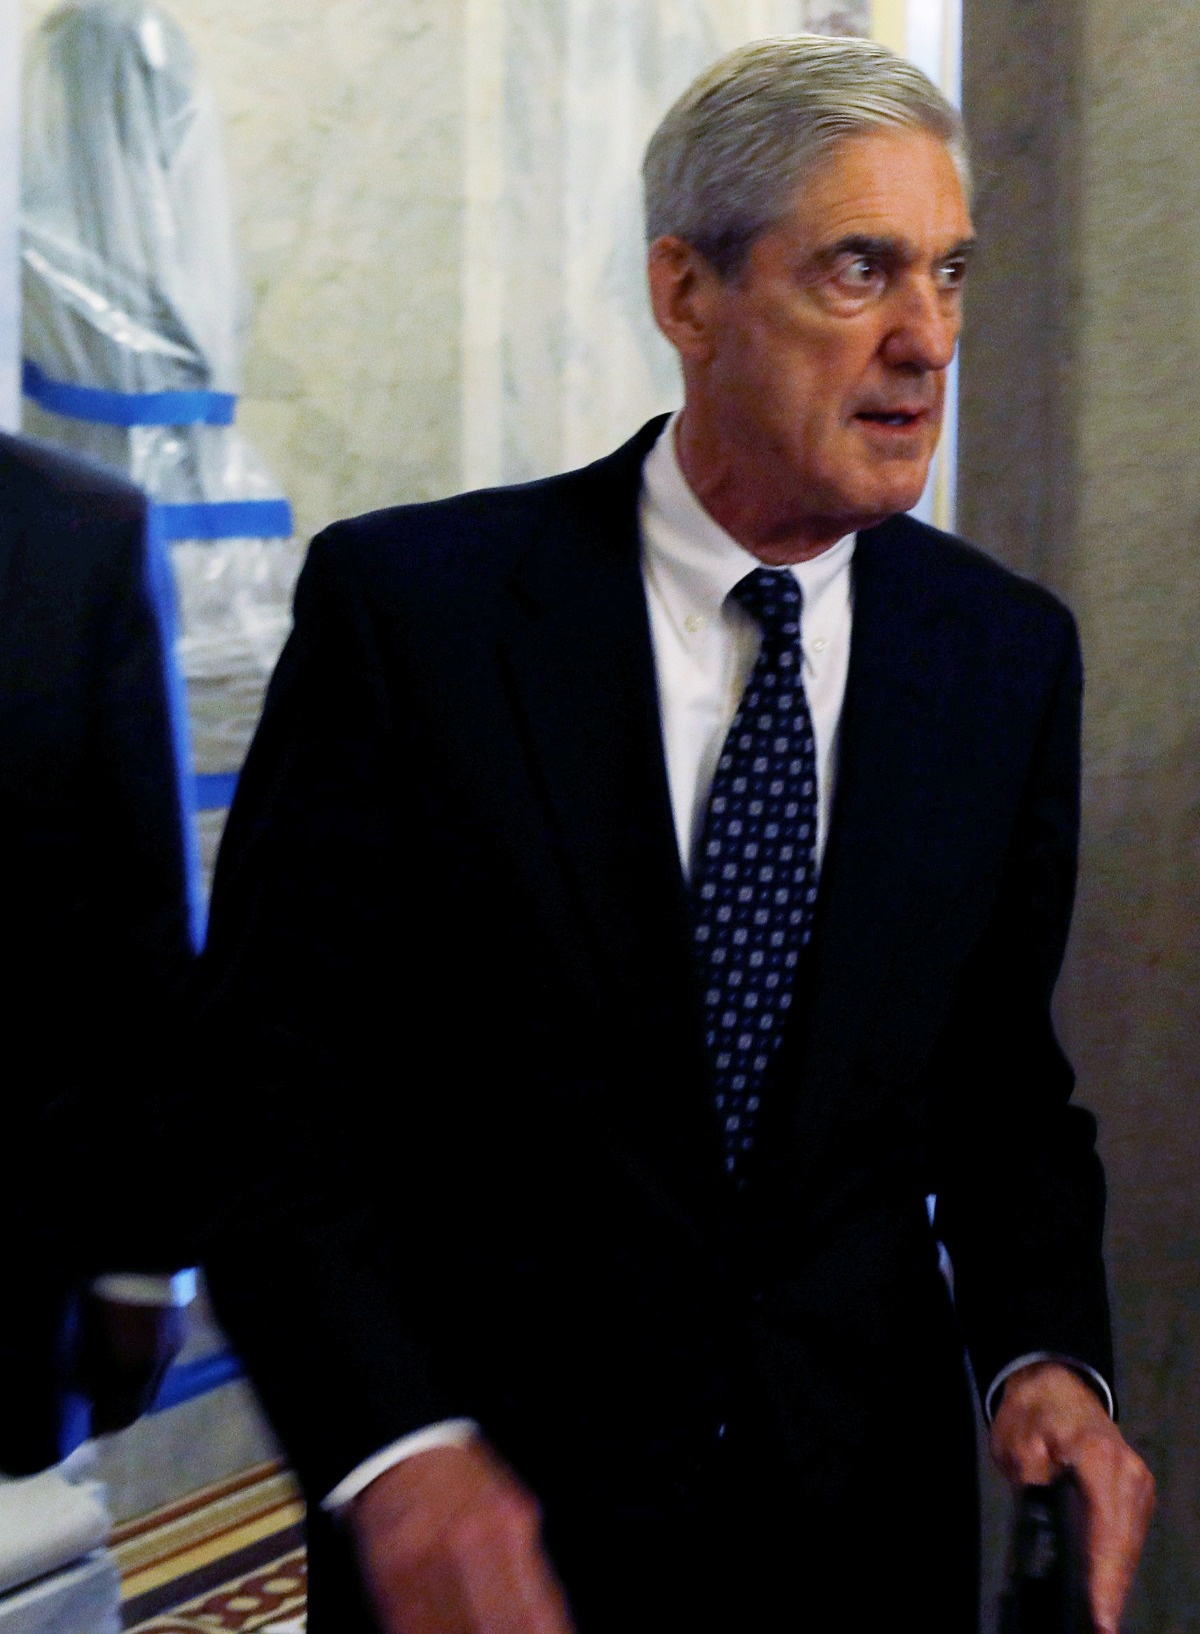 Mueller S Office Disputes Report Cohen Told To Lie Reuters Tv